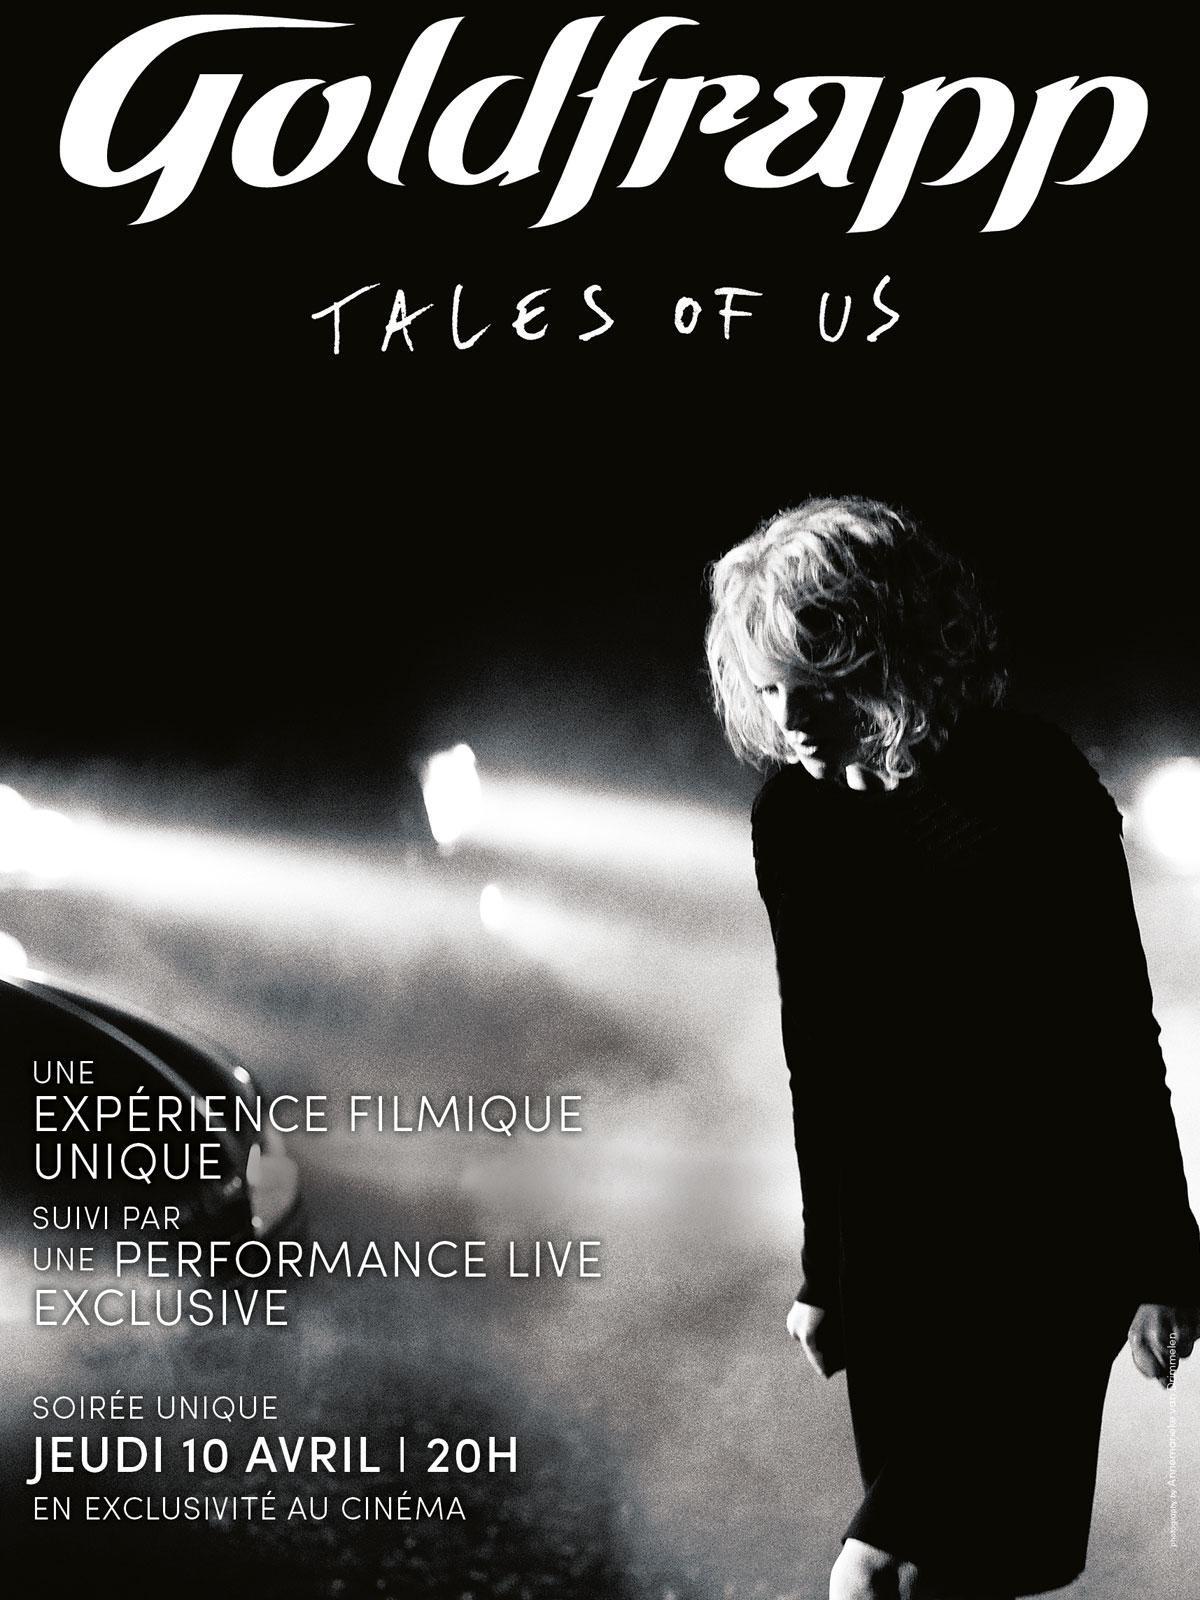 Télécharger Goldfrapp - Tales of us (Pathé Live) HDLight 1080p Complet Uploaded